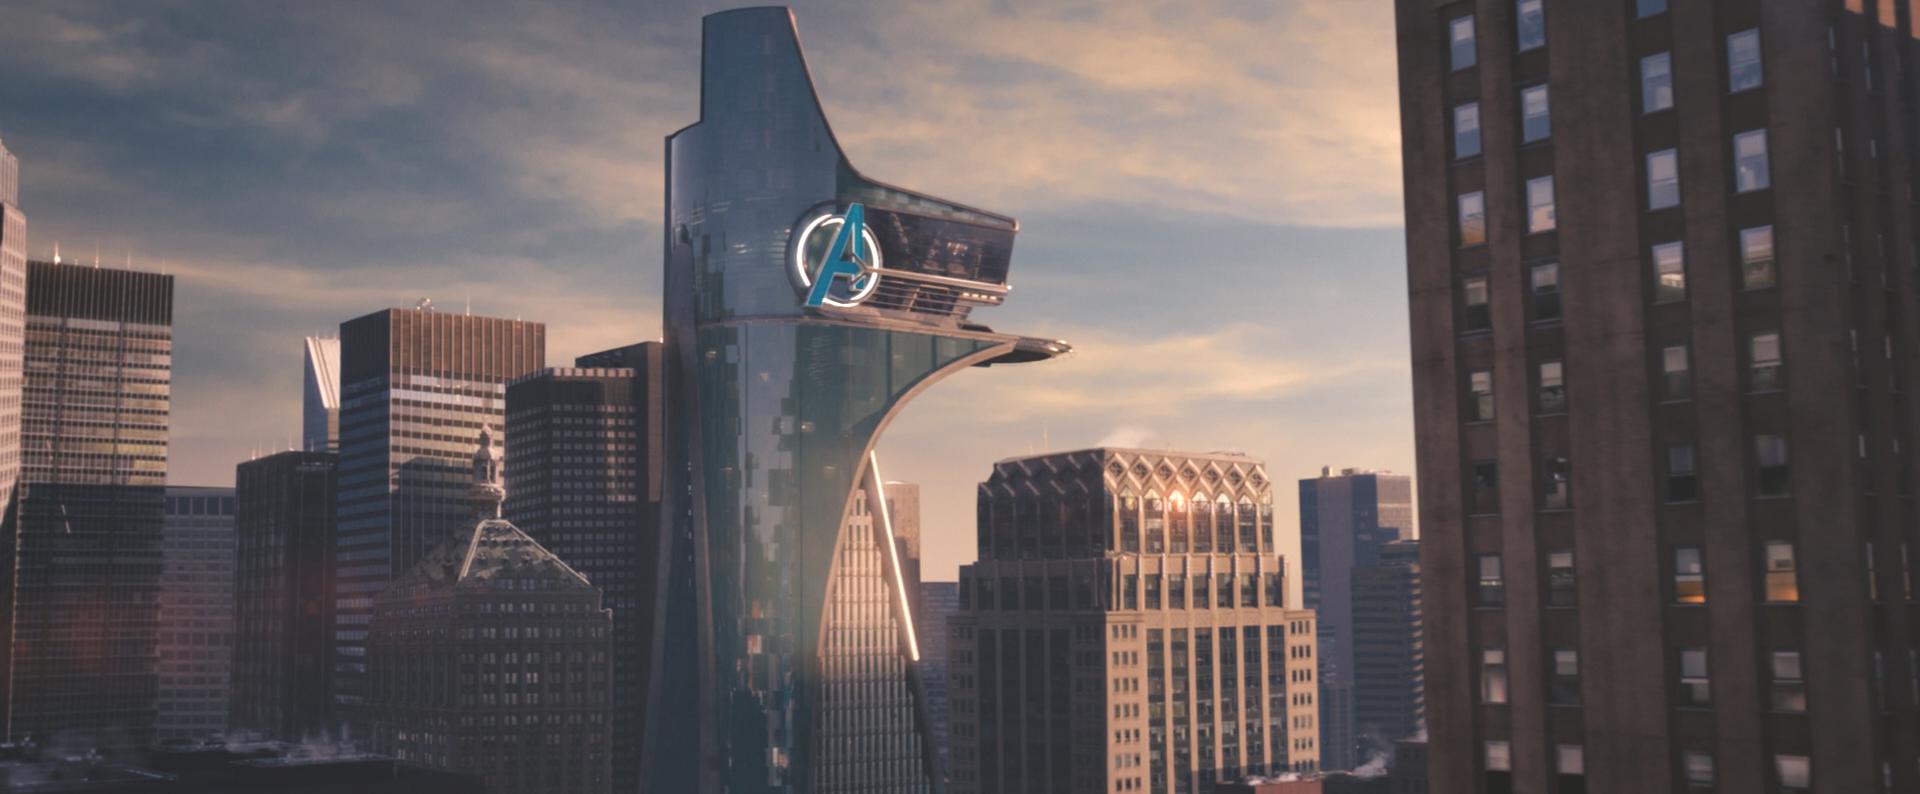 Avengers Tower | Marvel Cinematic Universe Wiki | Fandom